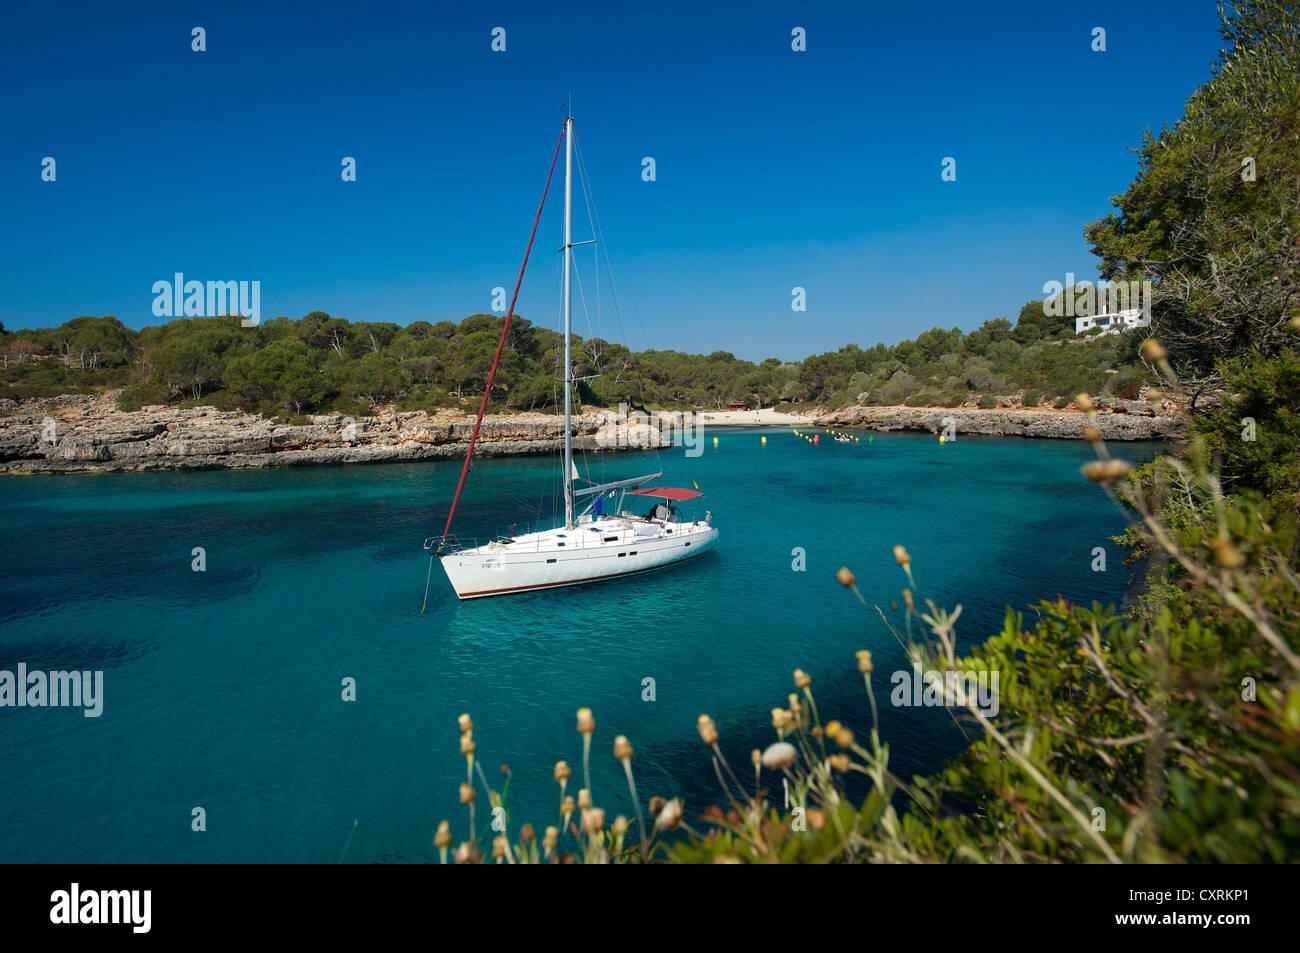 Sailing yacht in the Cala Sa Nau, Majorca, Balearic Islands, Spain, Europe - Stock Image